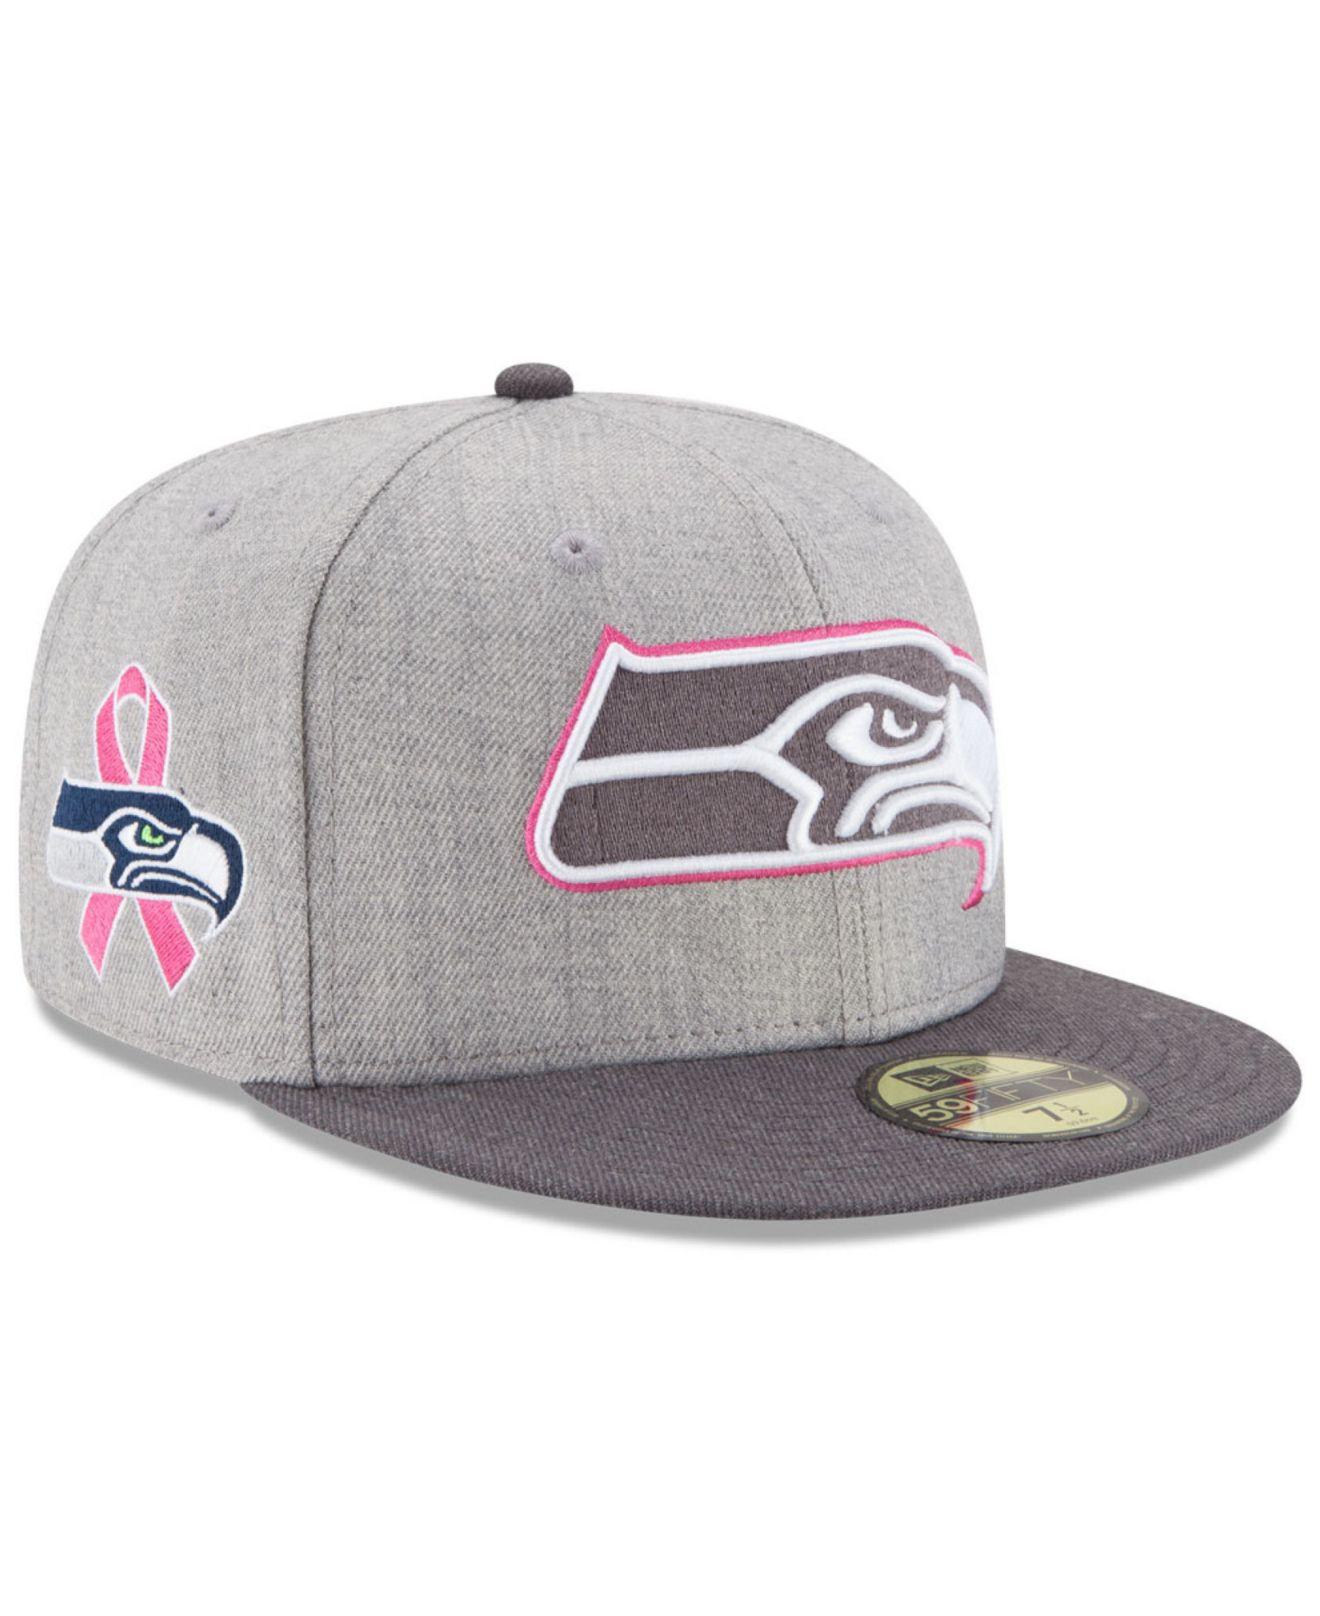 a0ca8ba1abe seahawk breast cancer hat